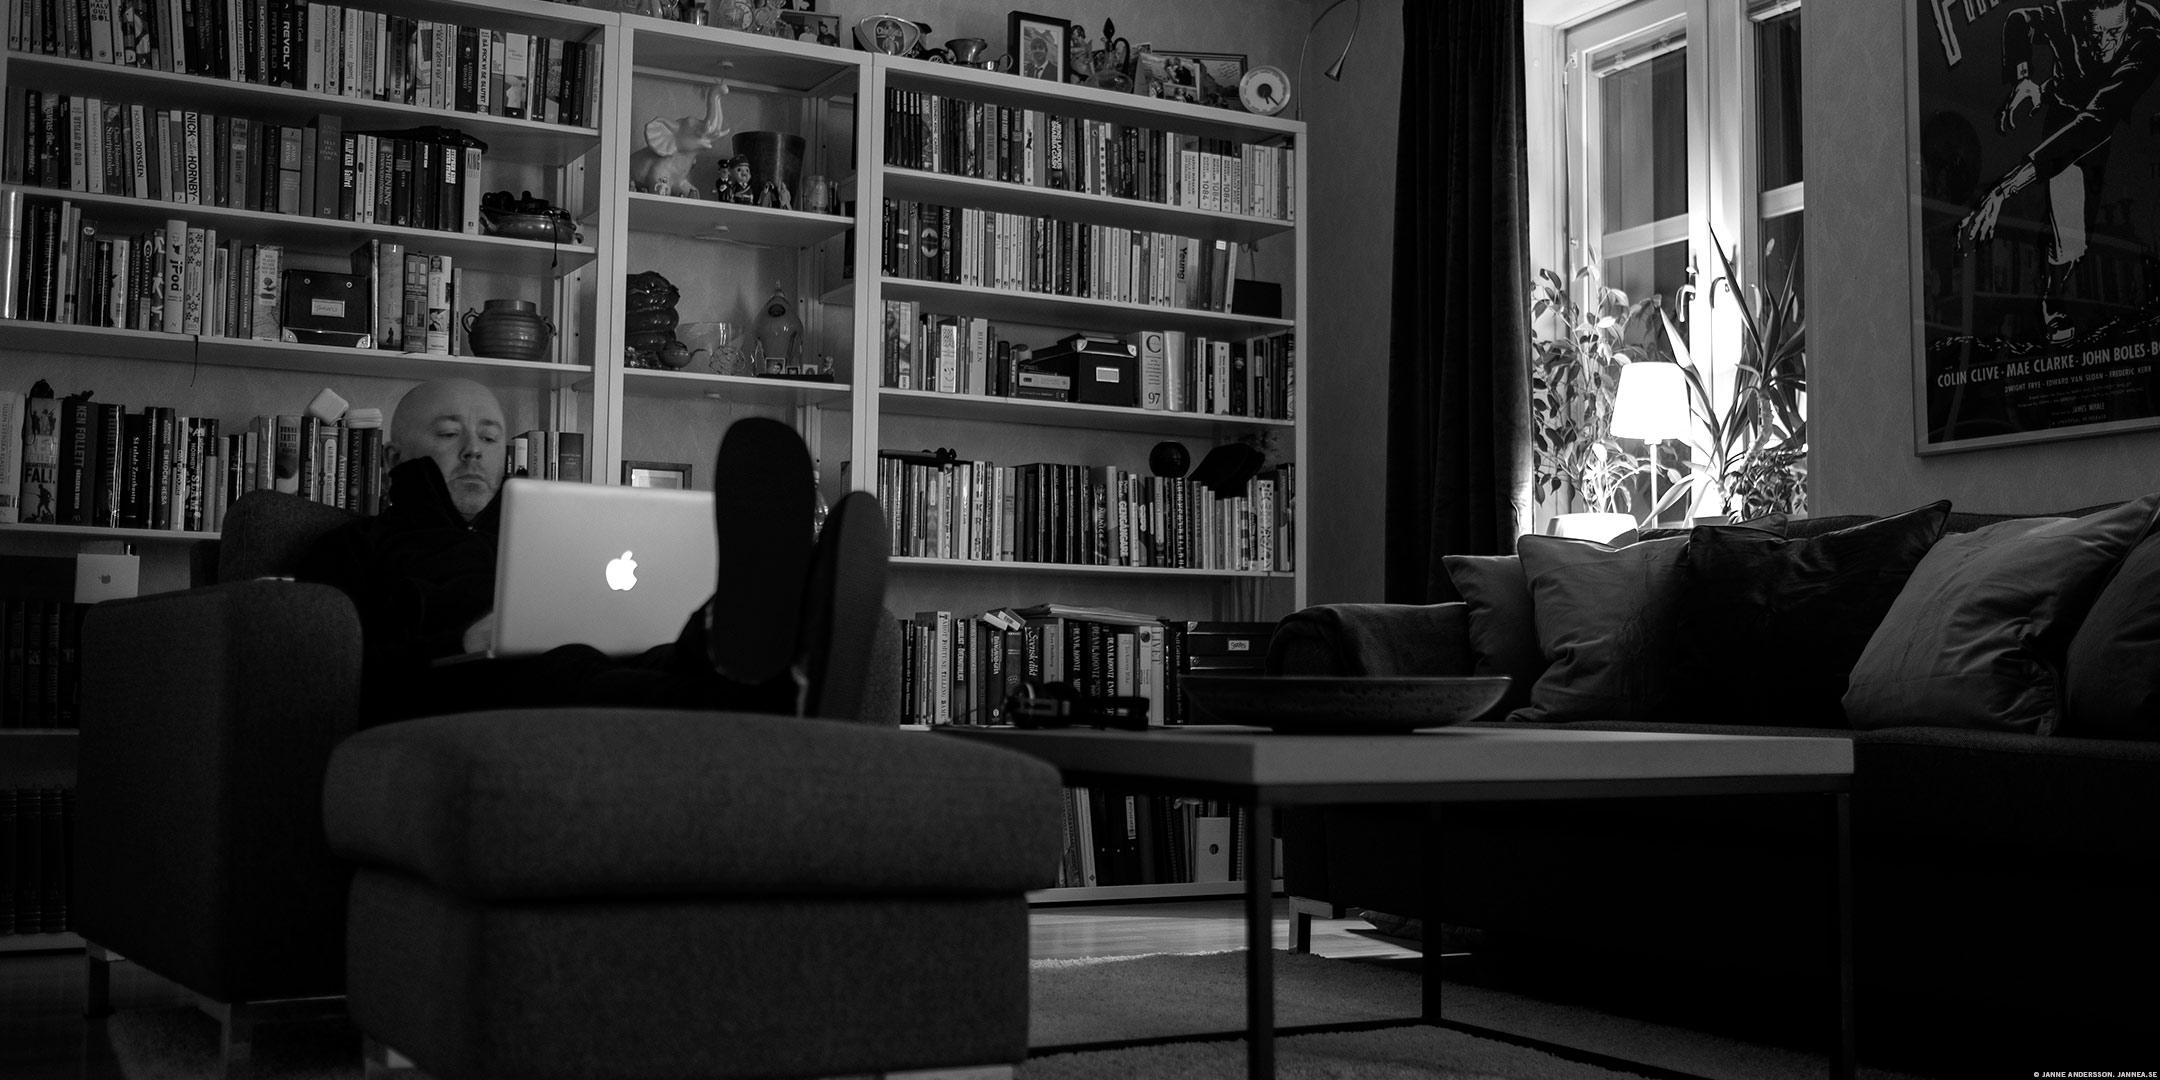 Latsöndag, halvslumrande i fåtöljen |© Janne A